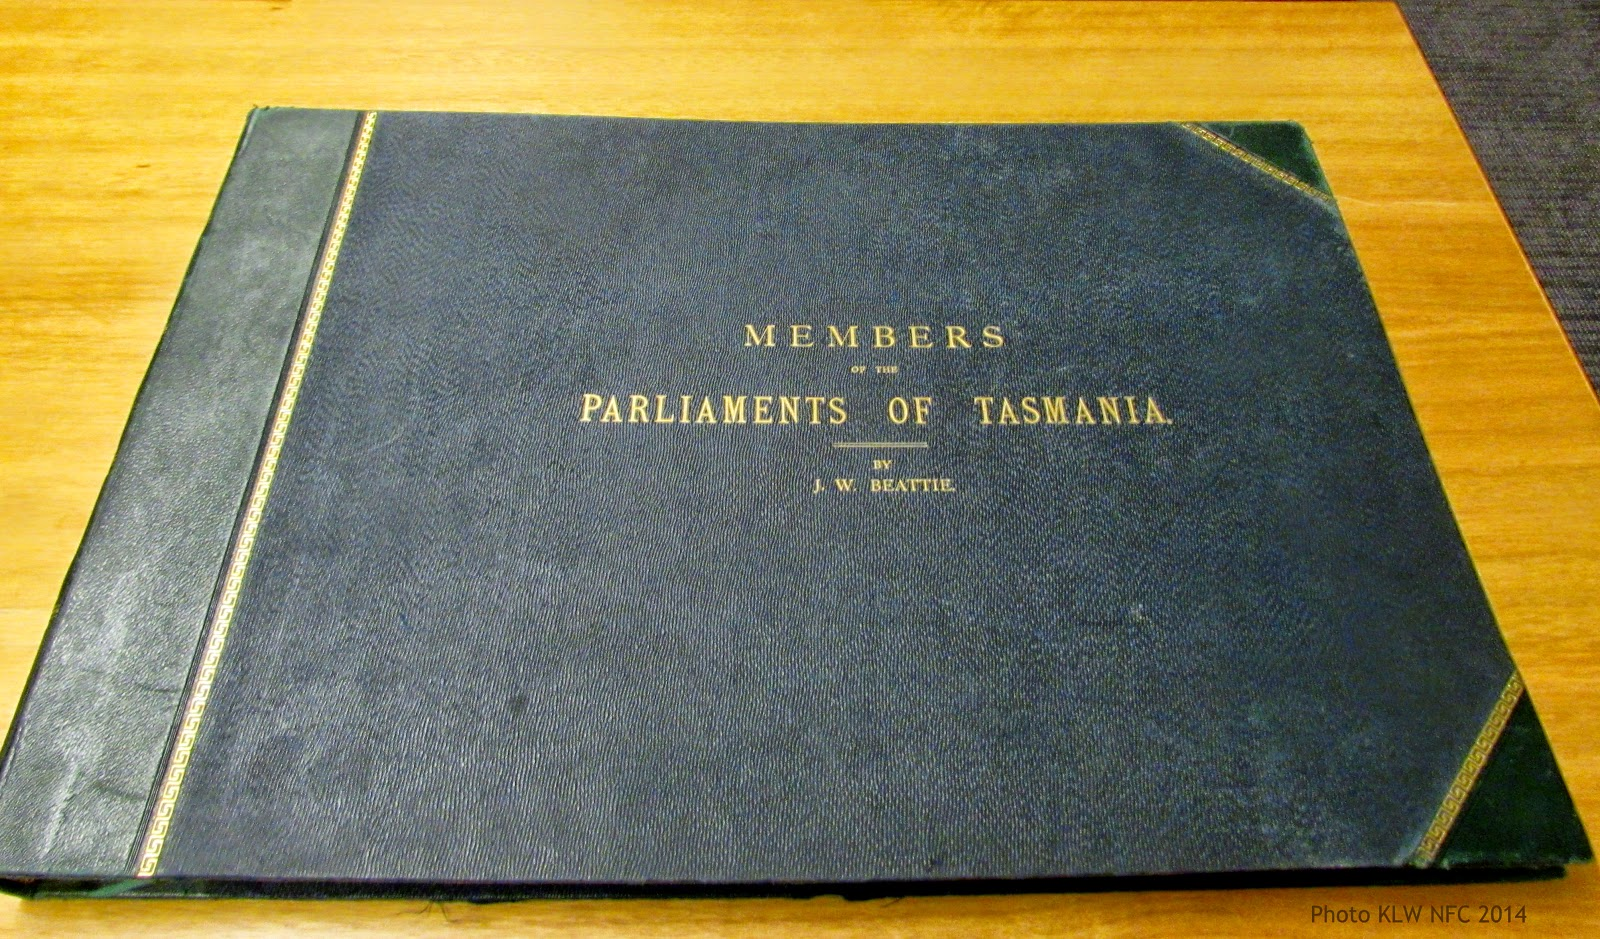 Blame it on Beattie: the Parliamentarians photograph